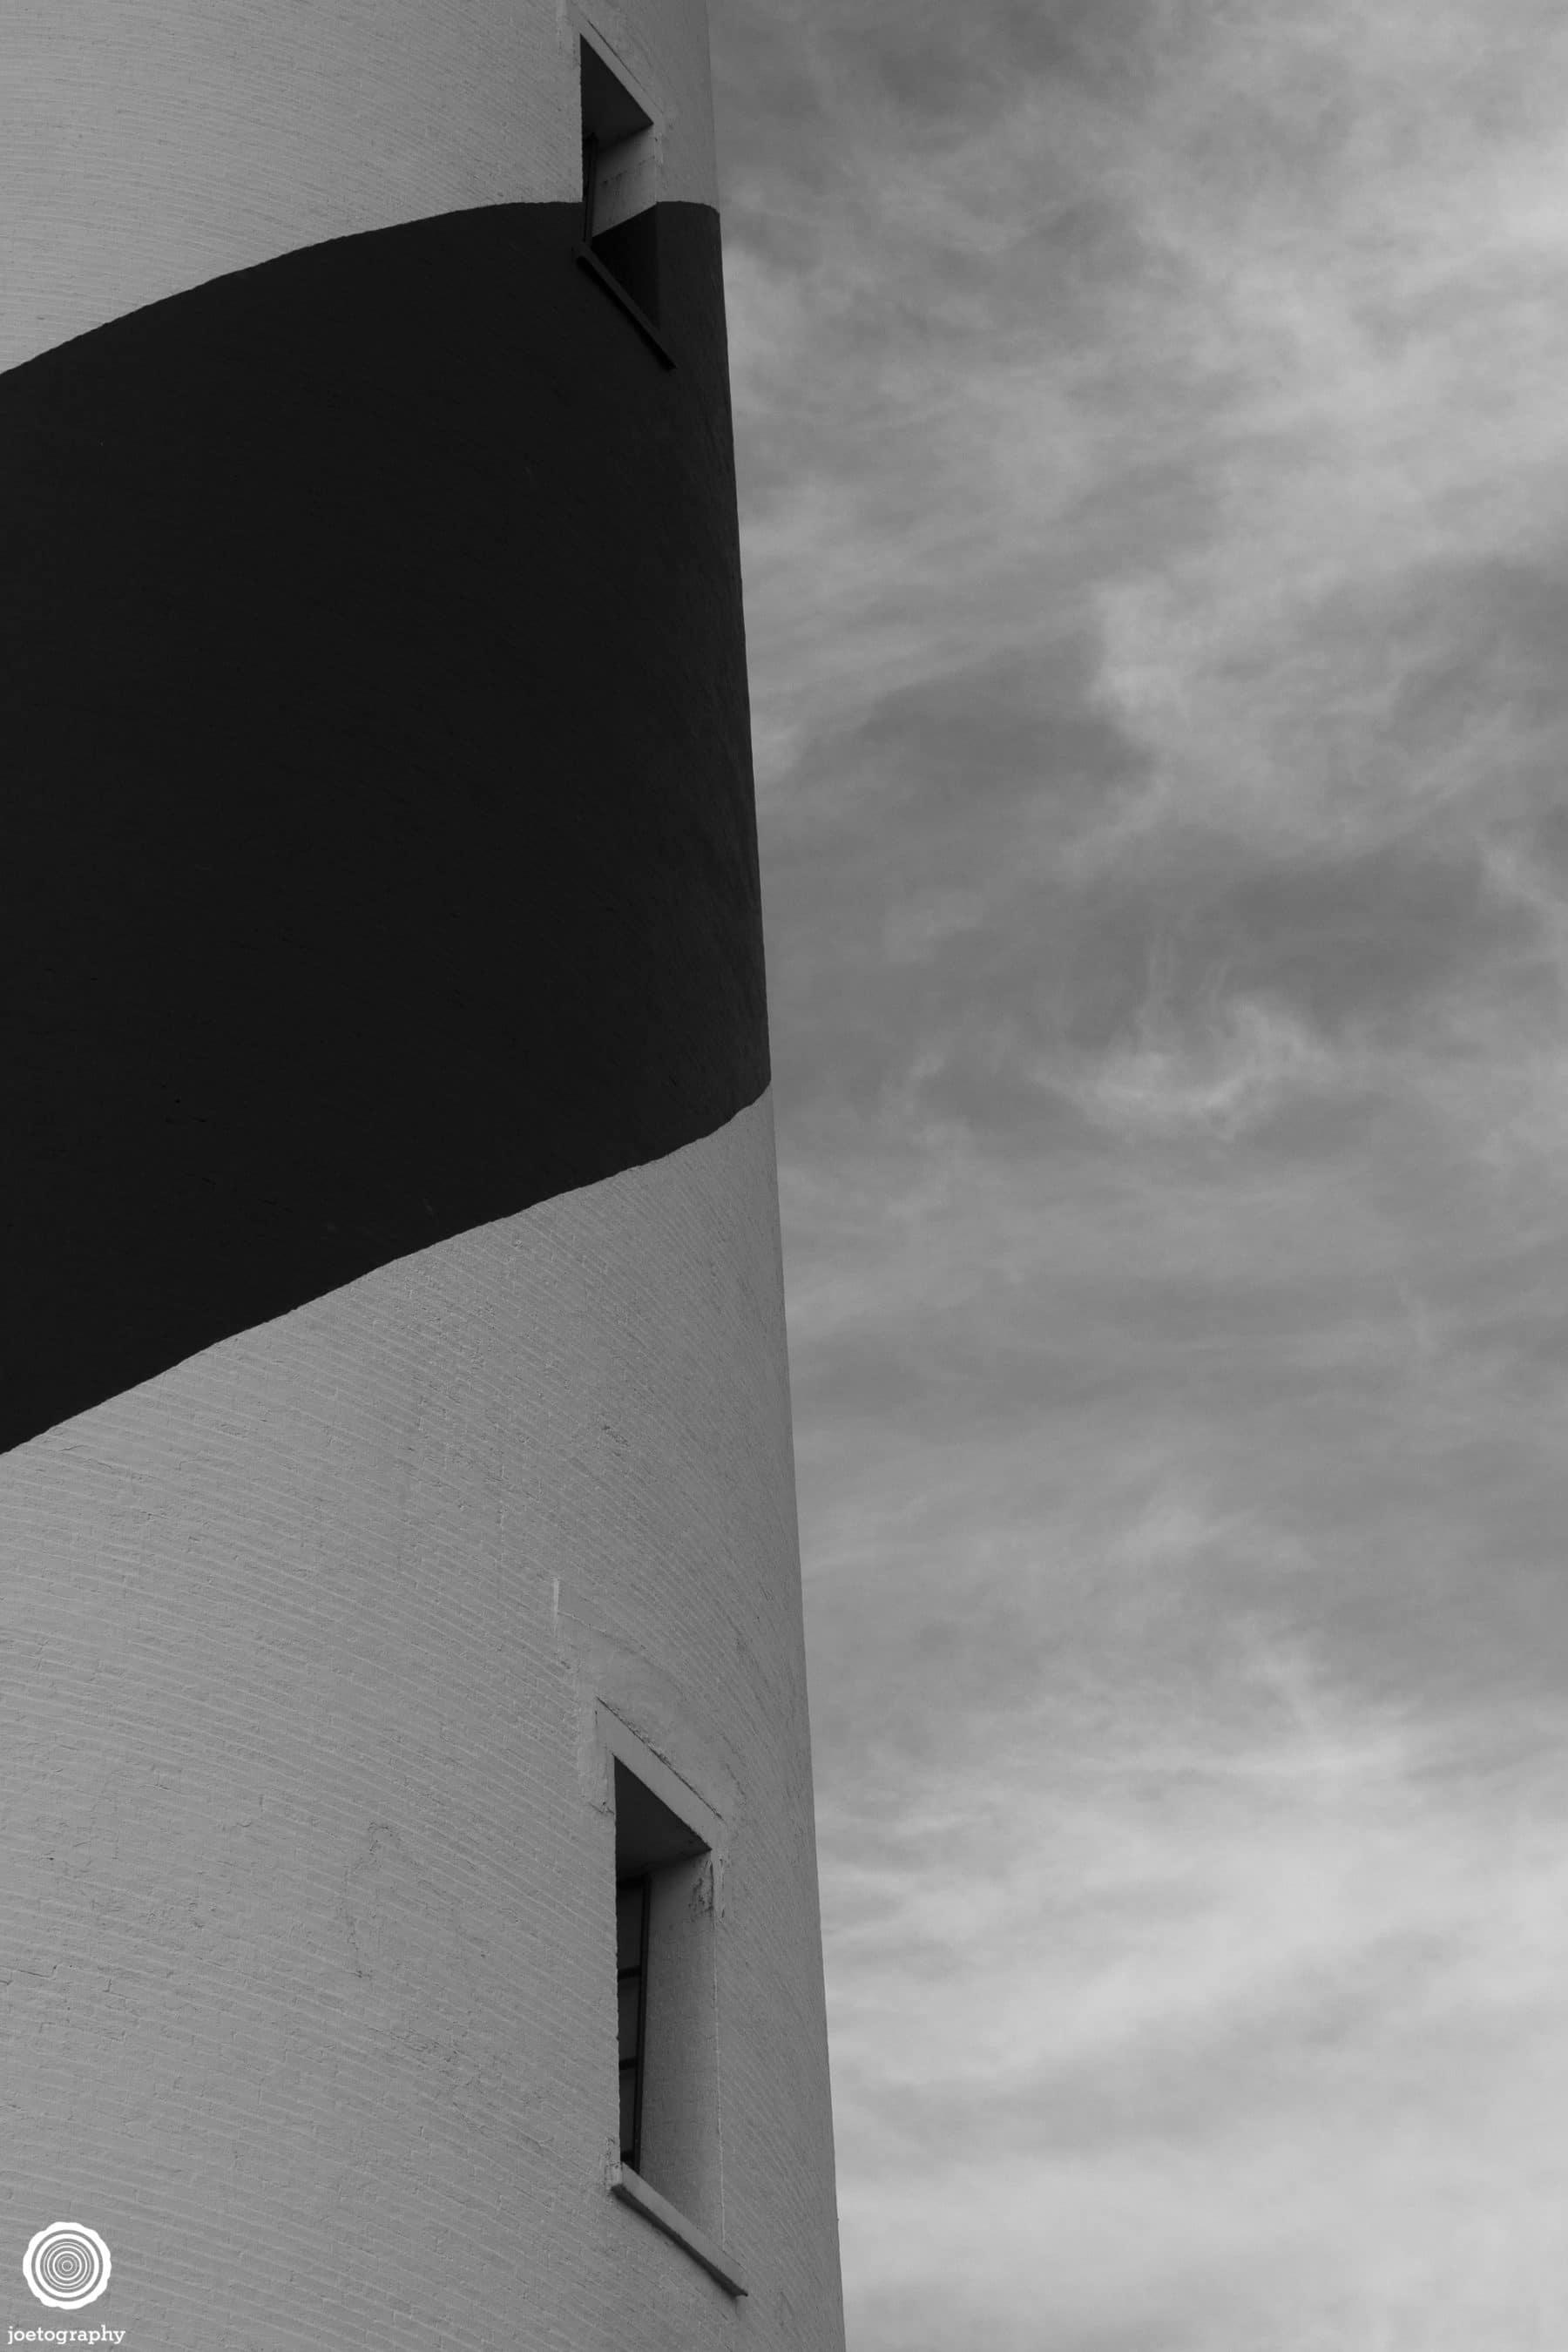 Outer-Banks-North-Carolina-Travel-Photography-48